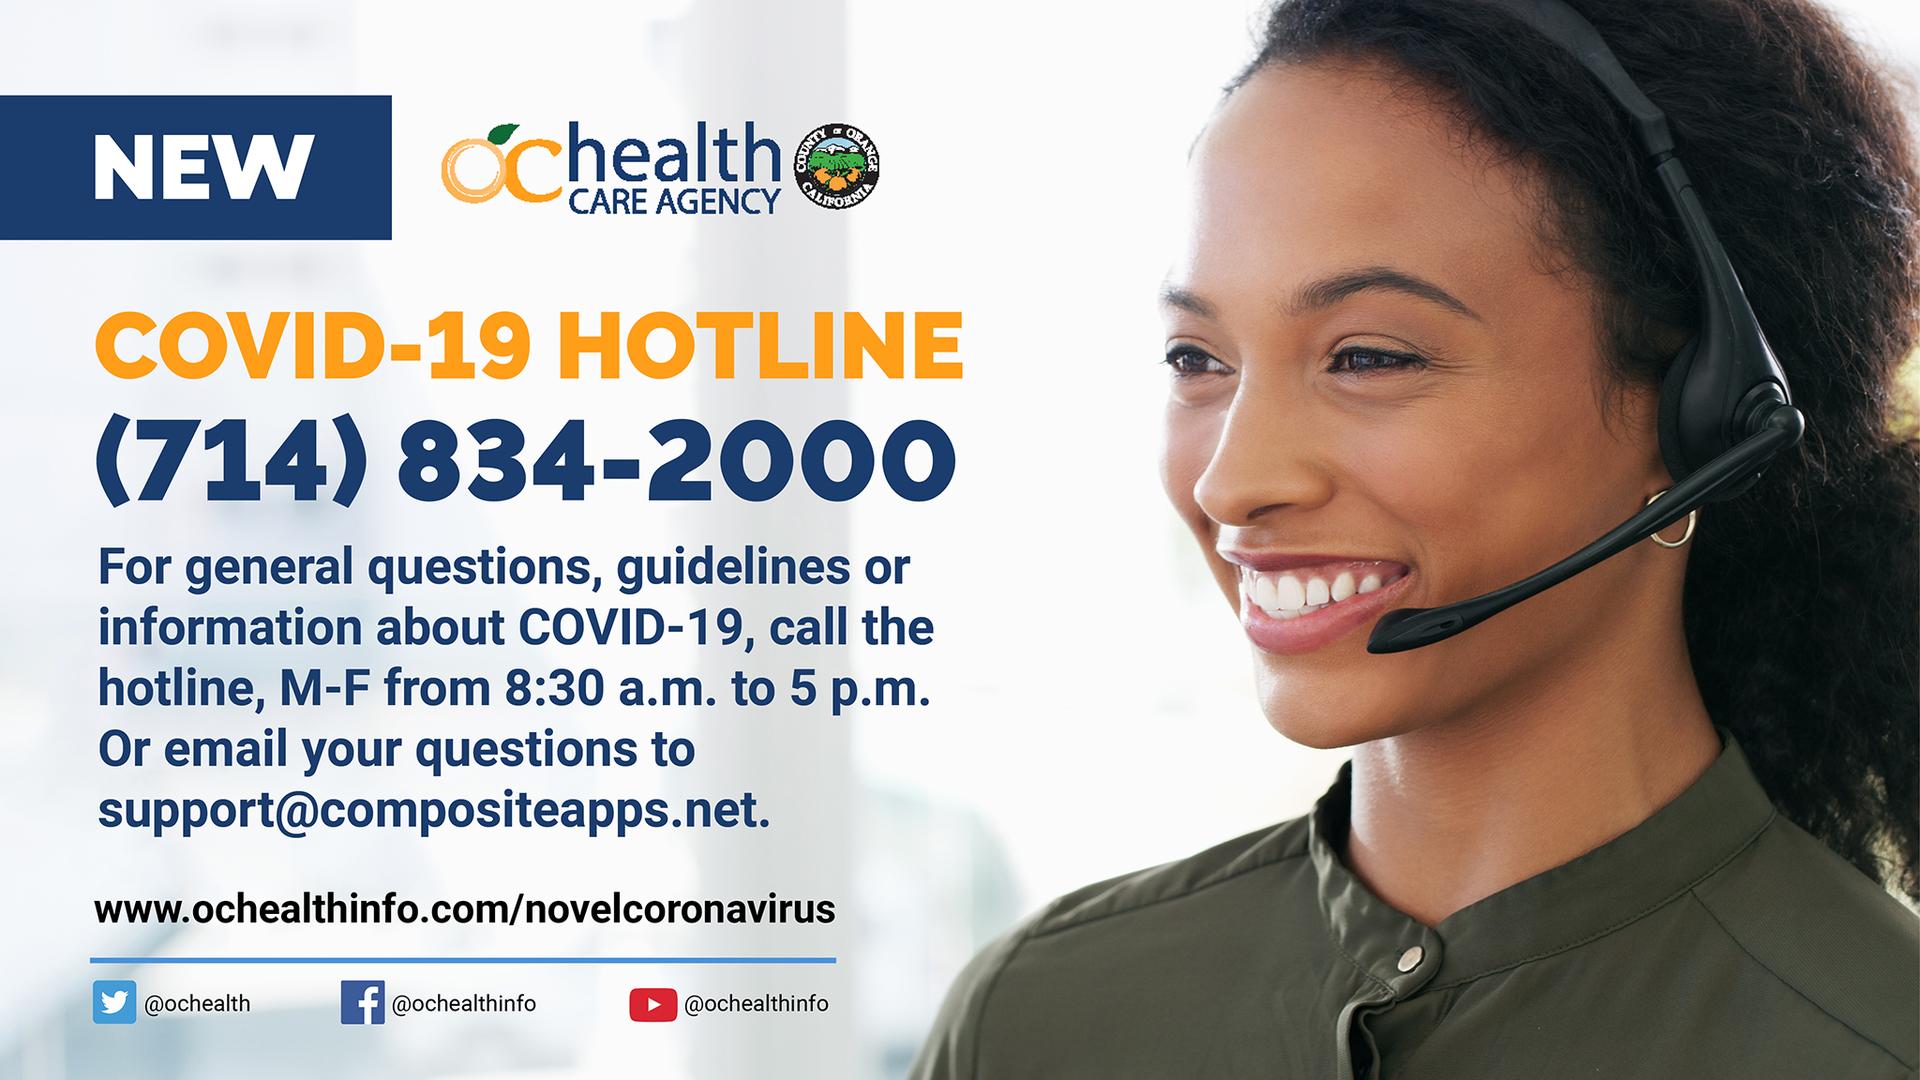 COVID-19 Hotline